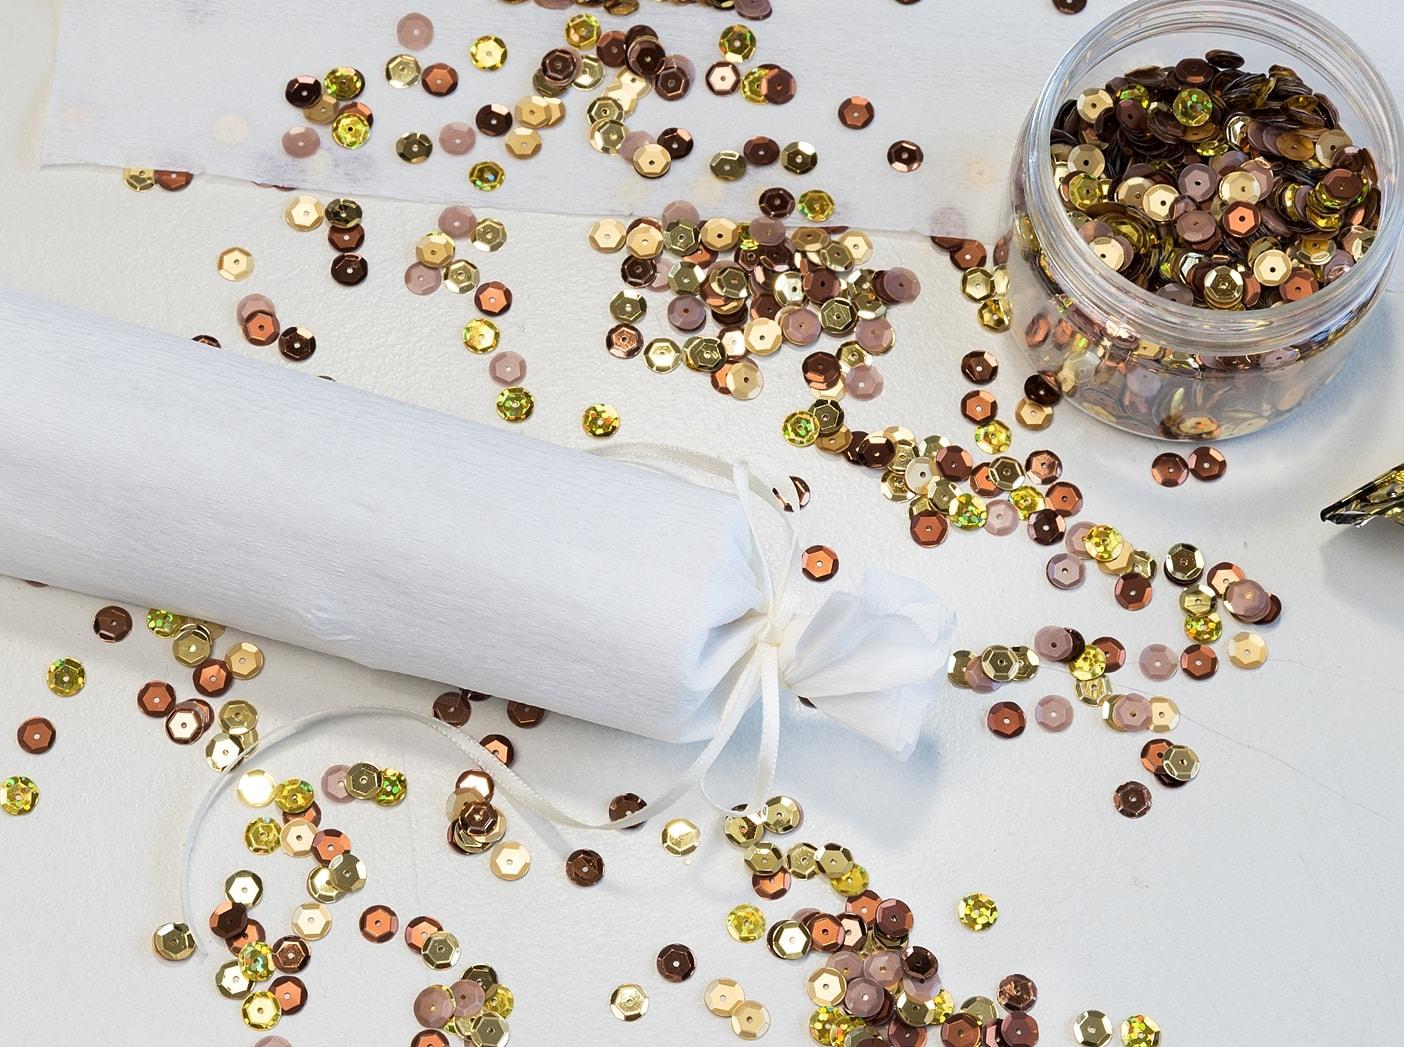 silvesterdeko-partyhut-und-knallbonbons 12k-min